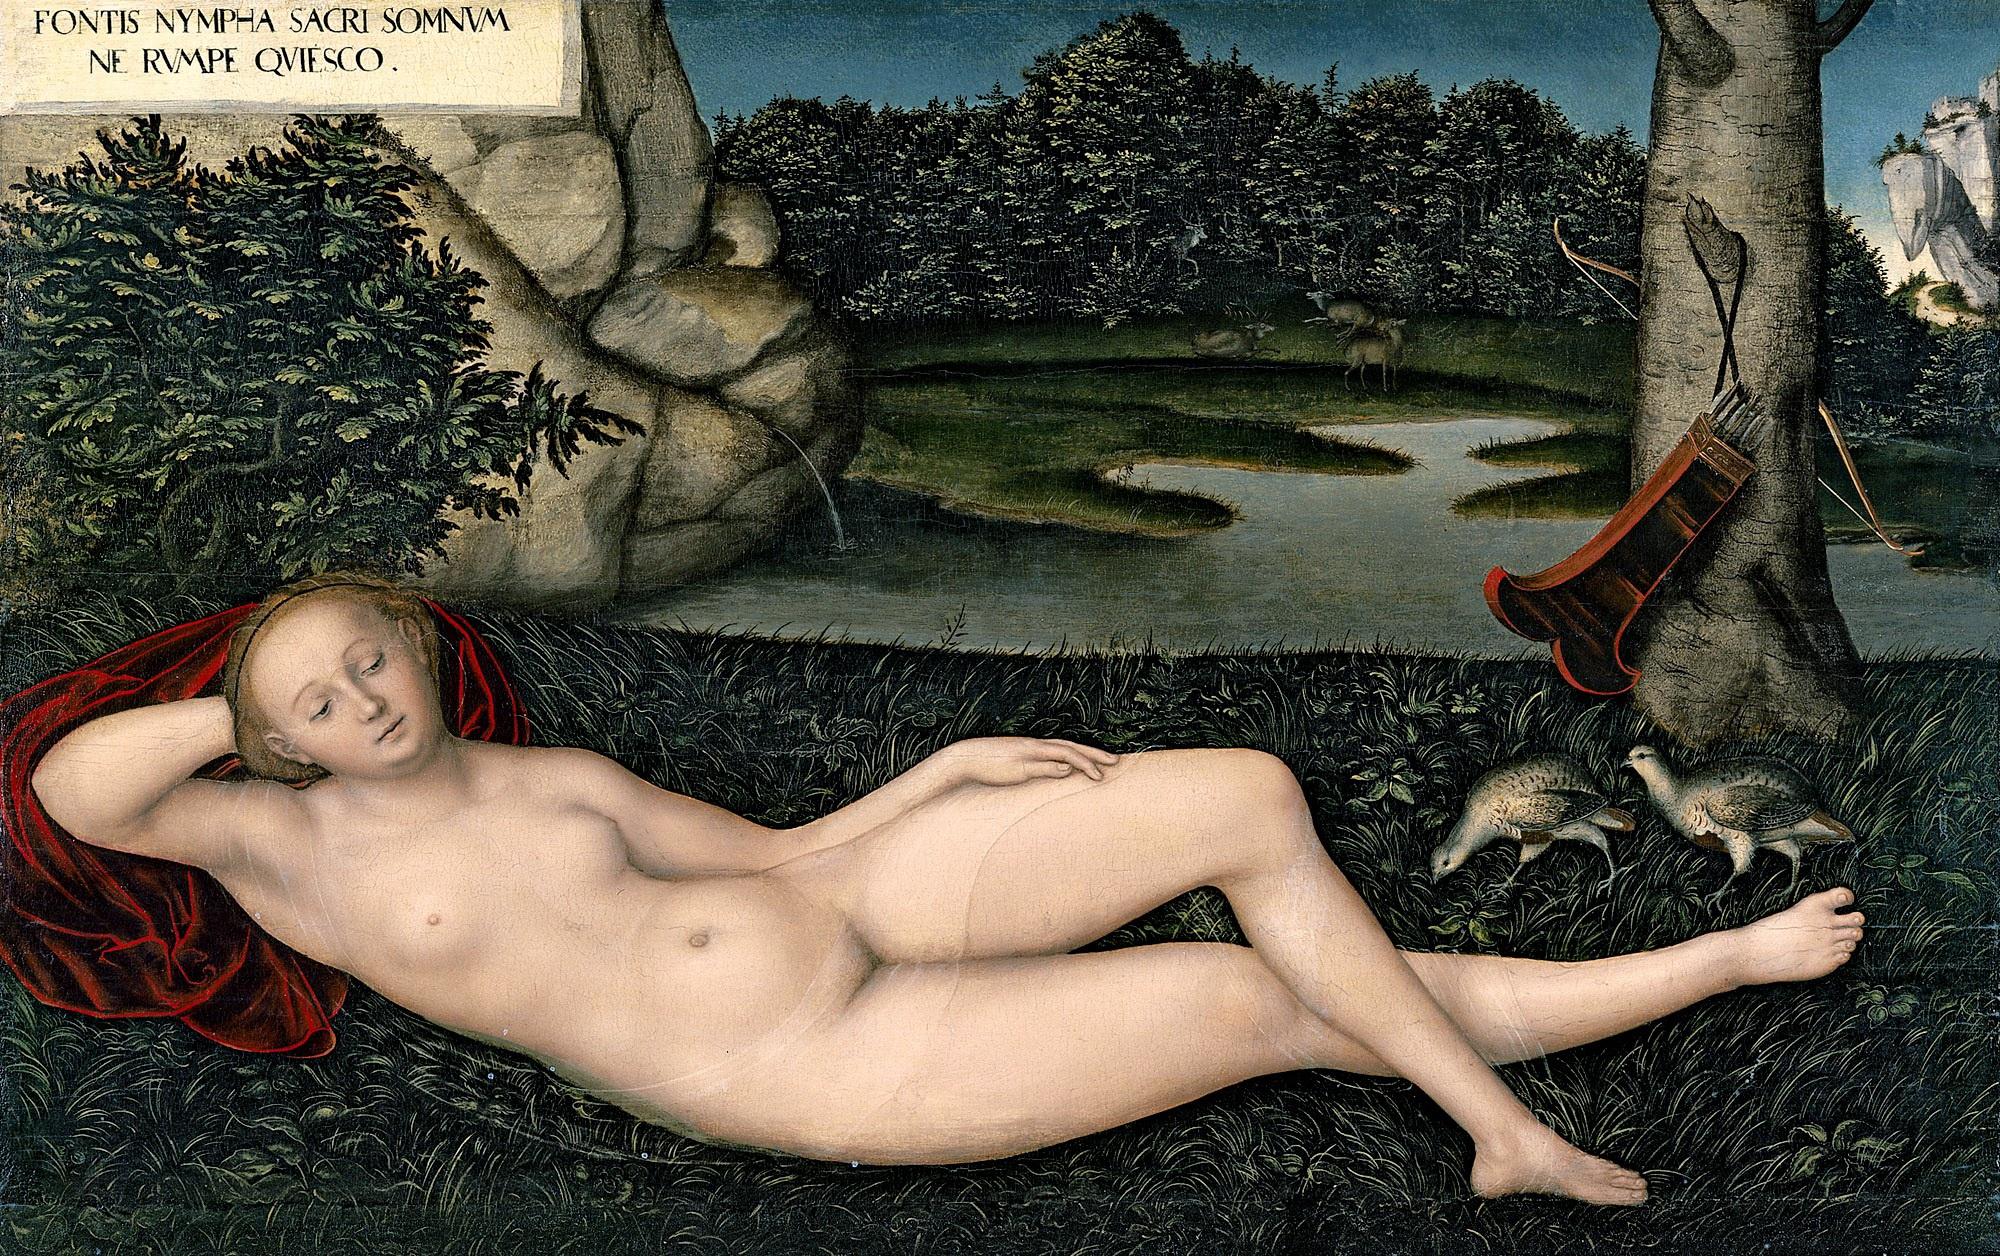 Lucas Cranach I, 1472-1553. Нимфа весны. 1530-1534. 75 x 120. Мадрид, музей Тиссена-Борнемисы